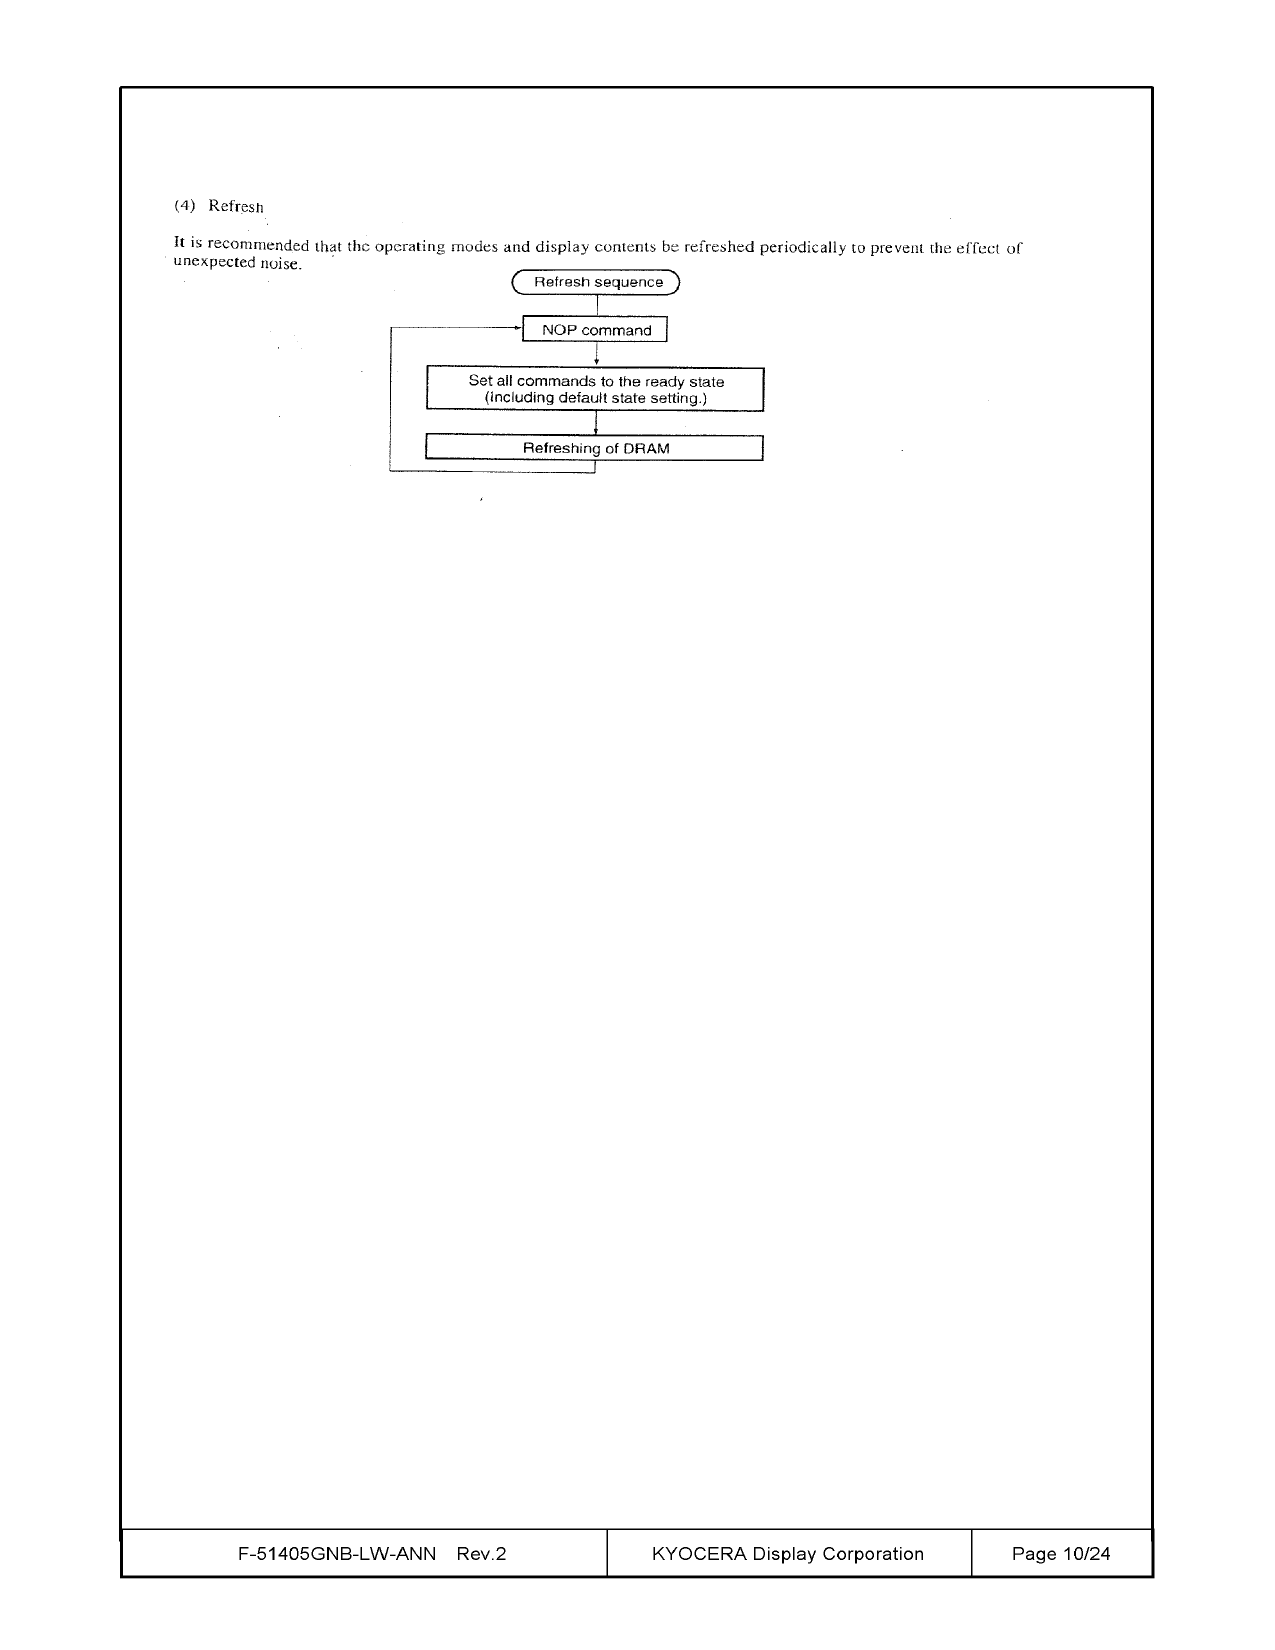 F-51405GNB-LW-ANN arduino